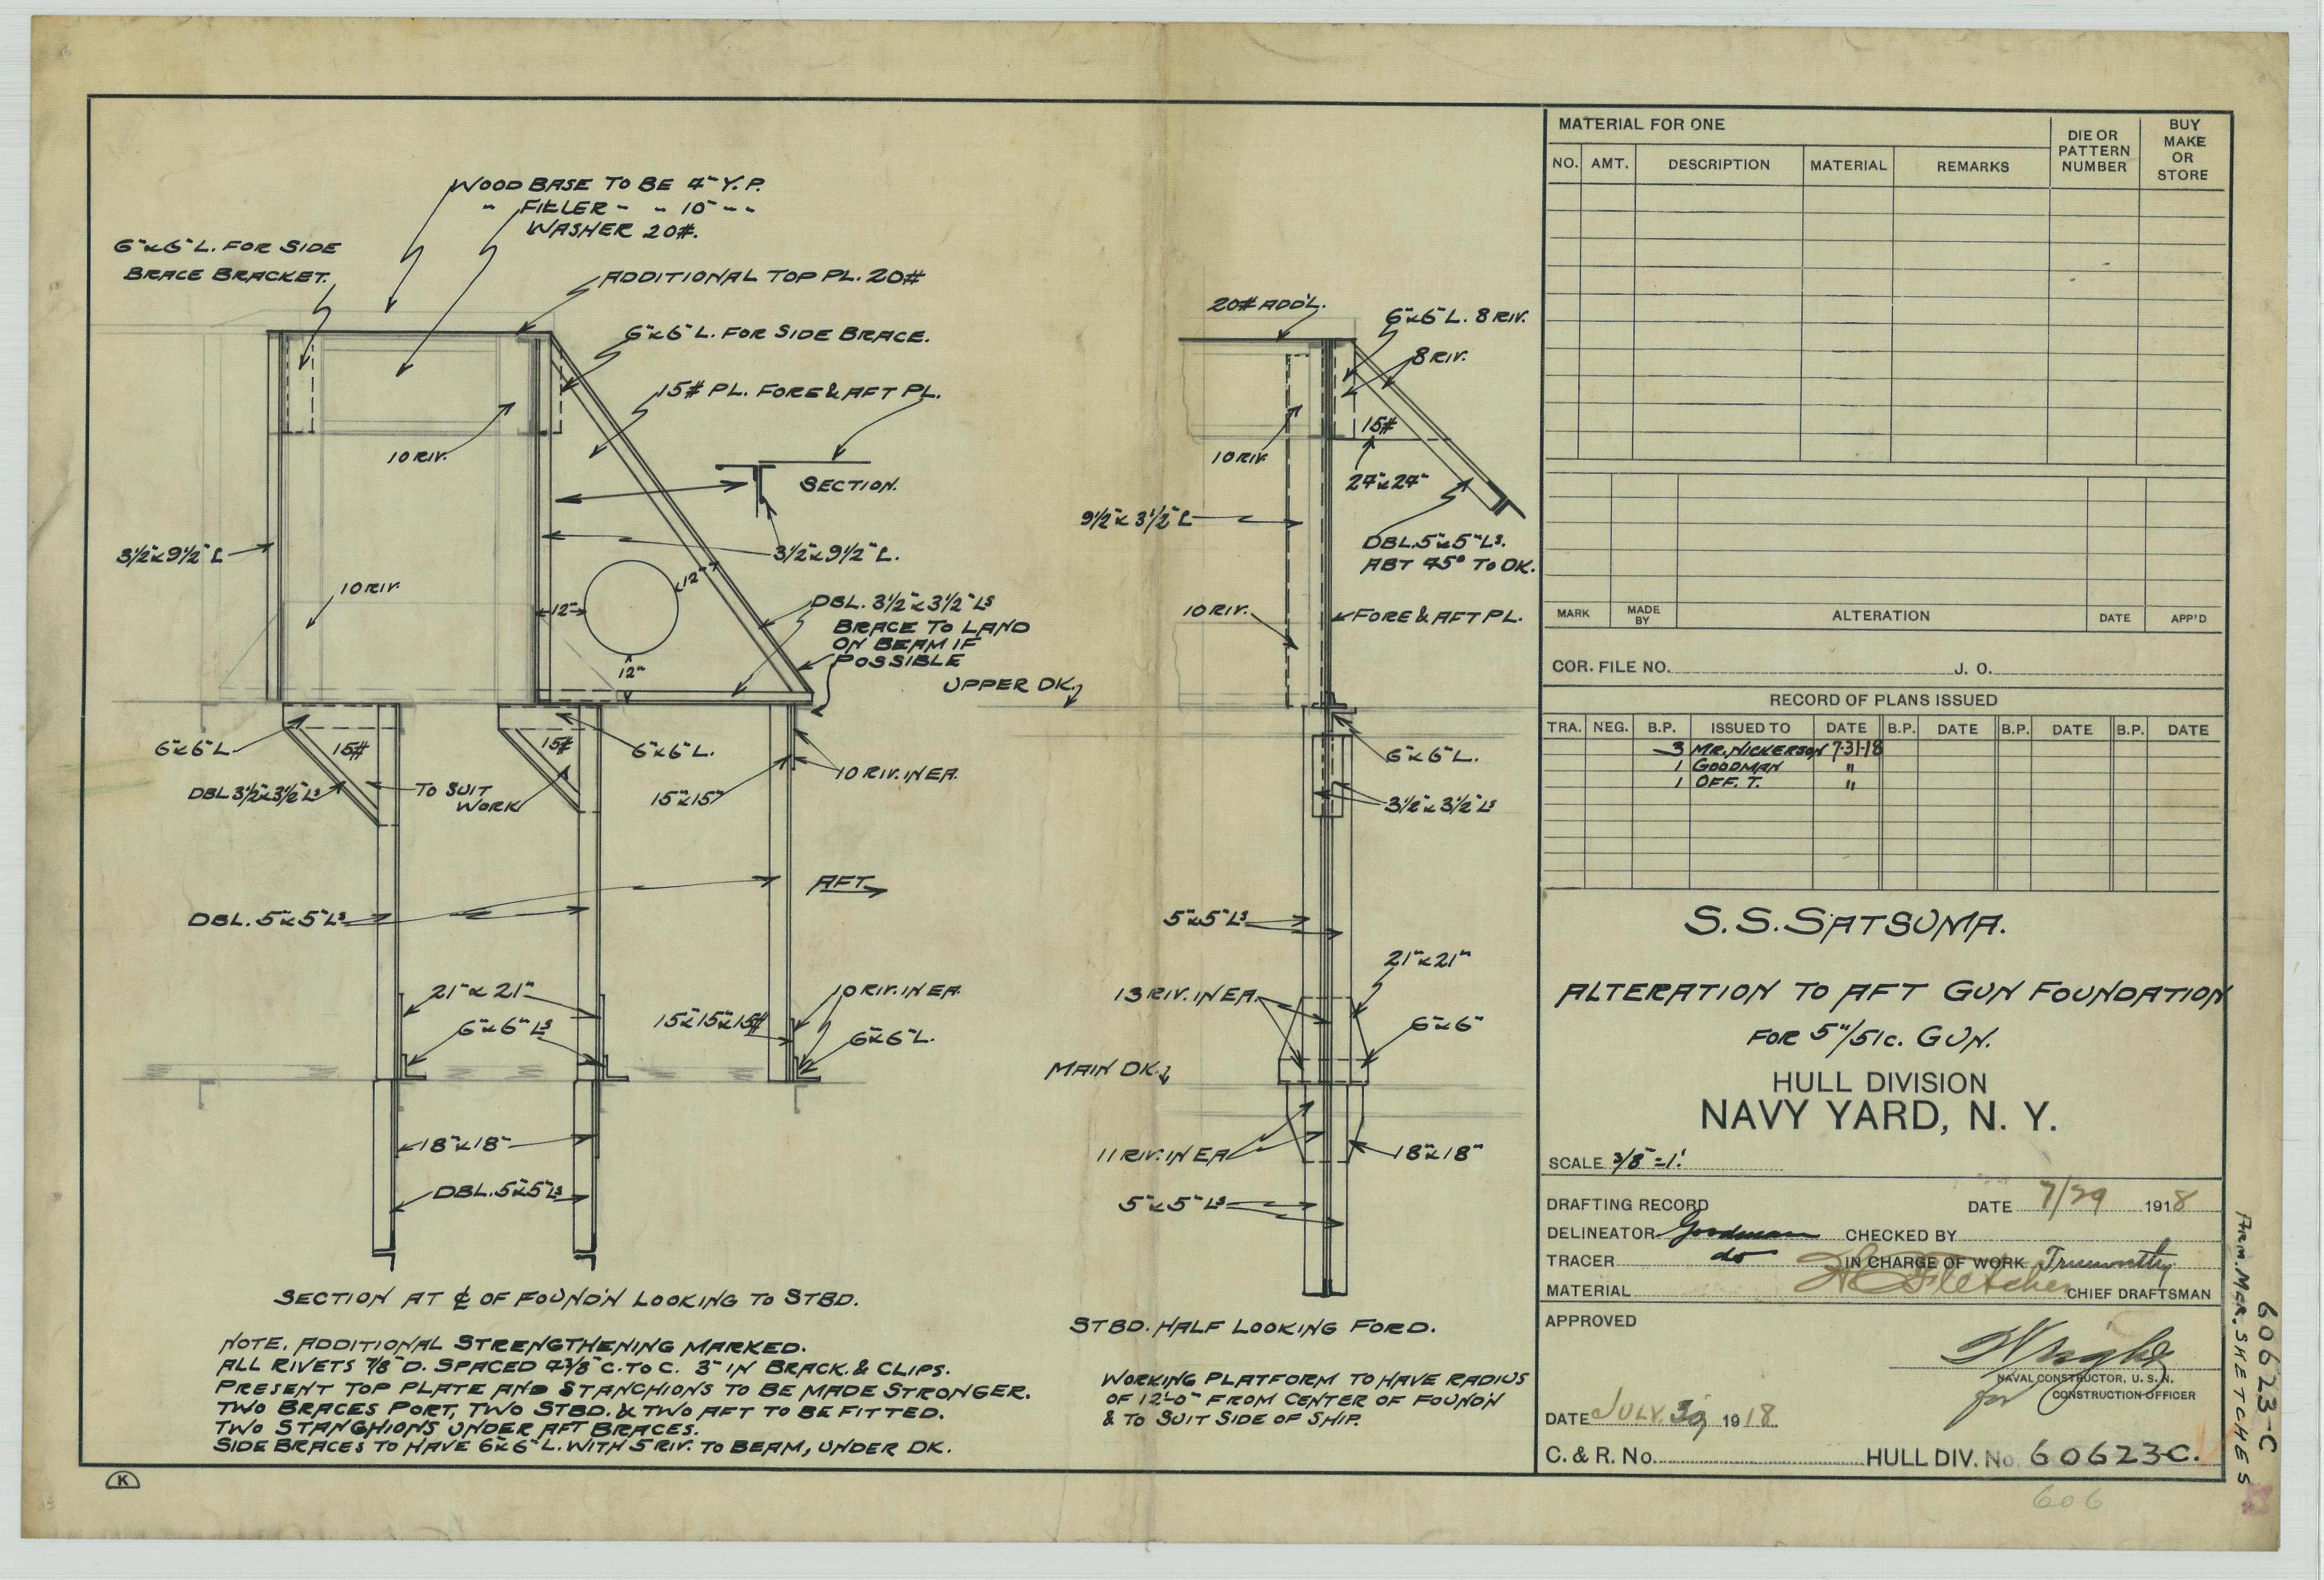 USS Satsuma (ID-2038): Alteration to Aft Gun Foundation for 5/51c. Gun.